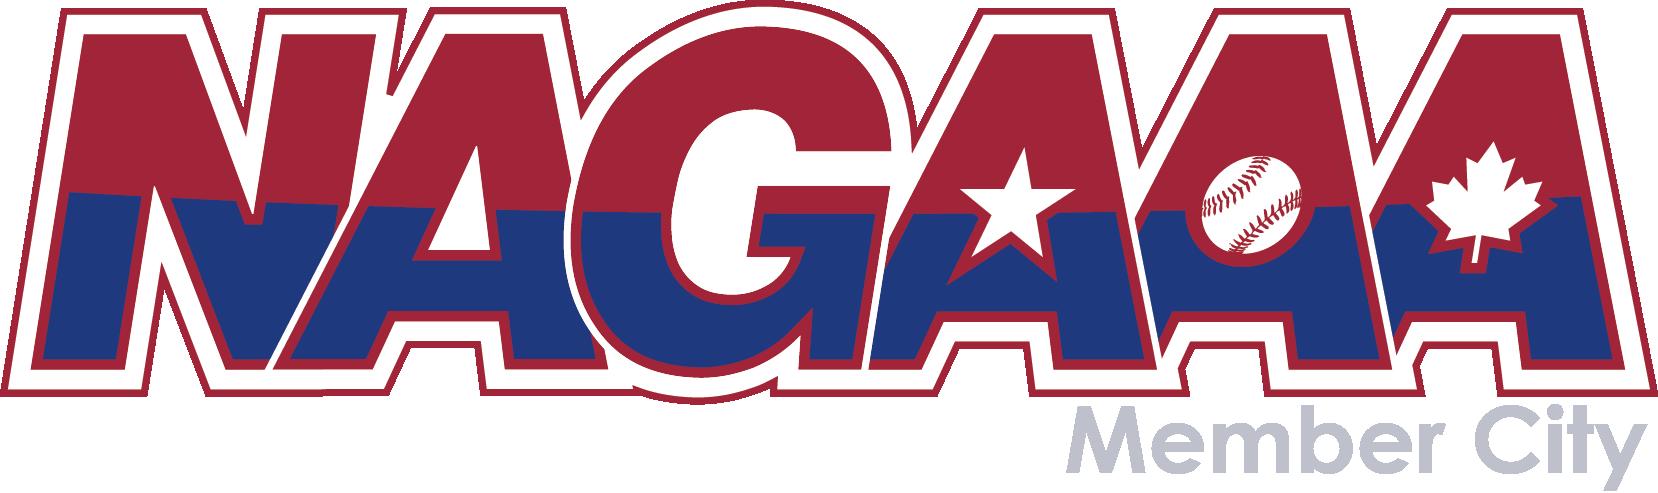 nagaaa-membercity-logo